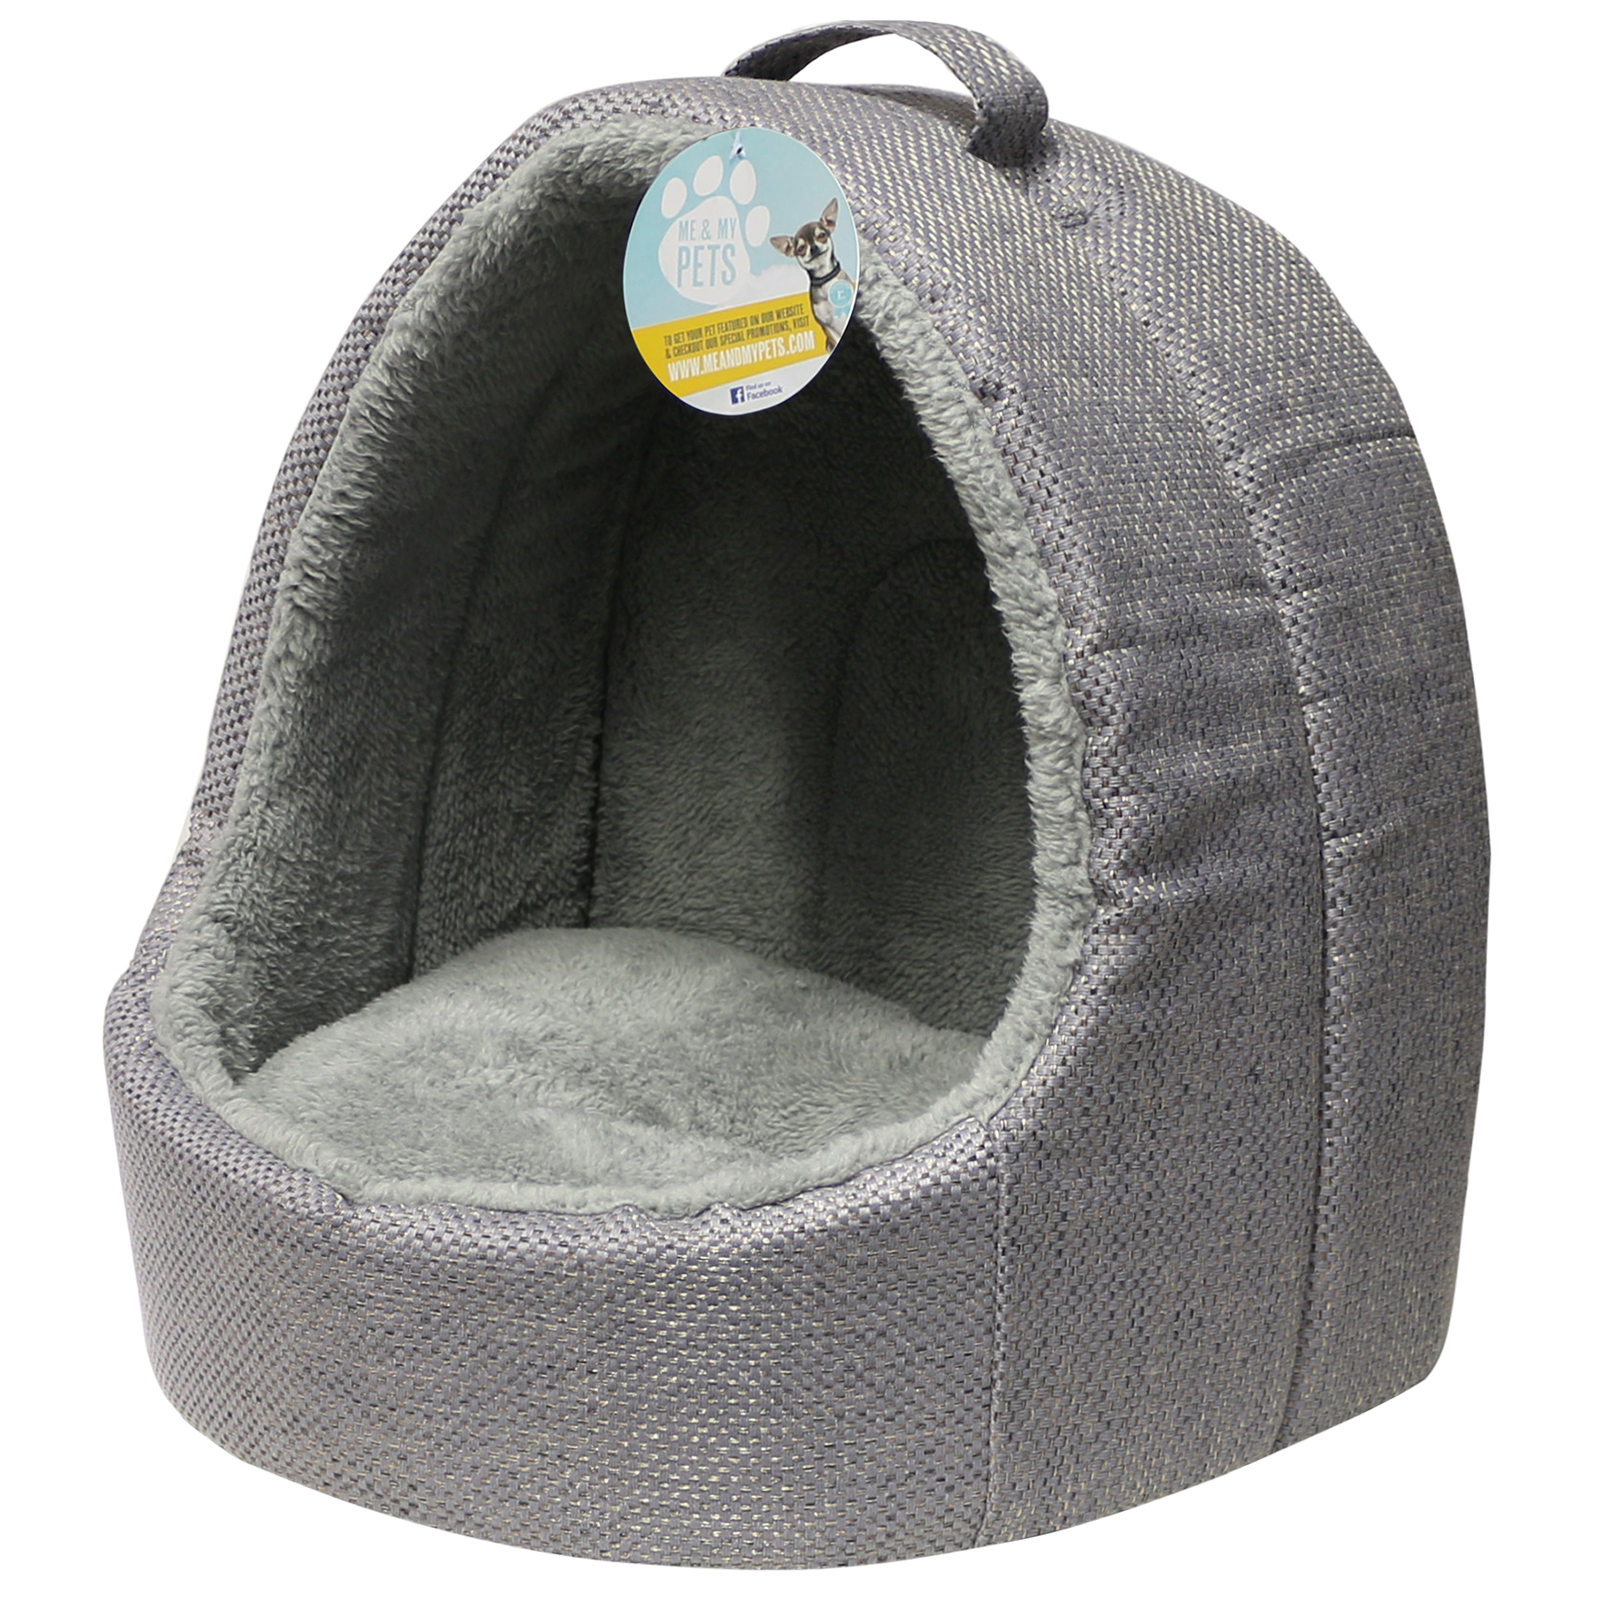 Me Amp My Grey Soft Fleece Igloo Cat Bed Pet Kitten Dog